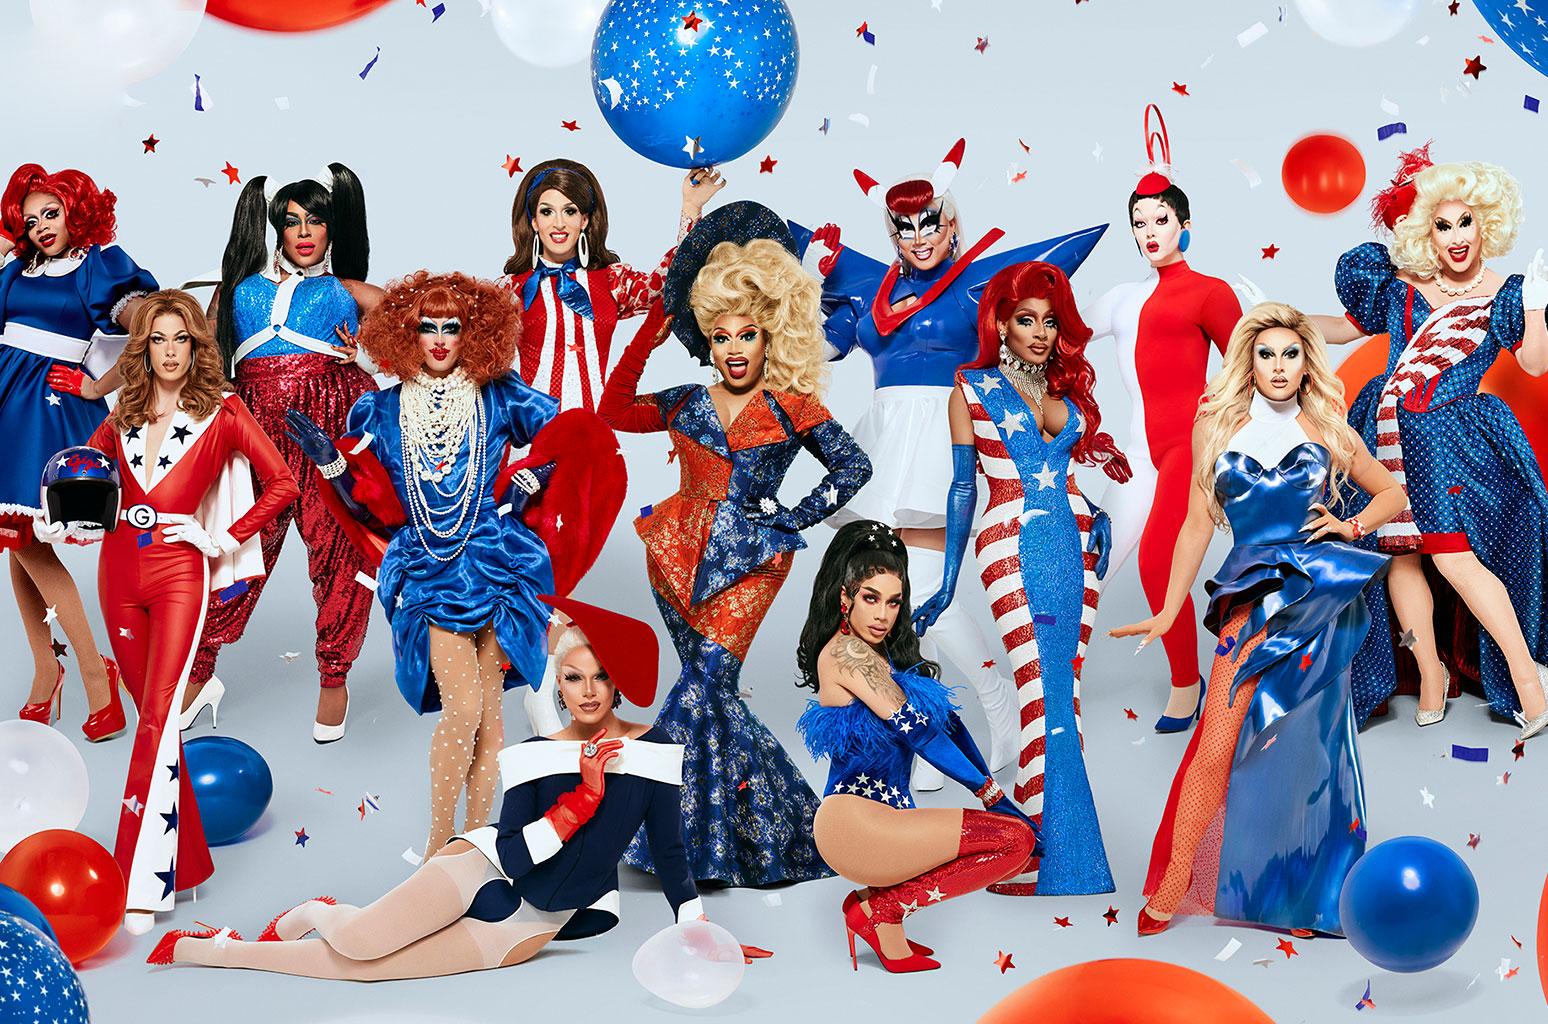 'RuPaul's Drag Race': Season 12 Queens Spill the Tea on Getting Cast